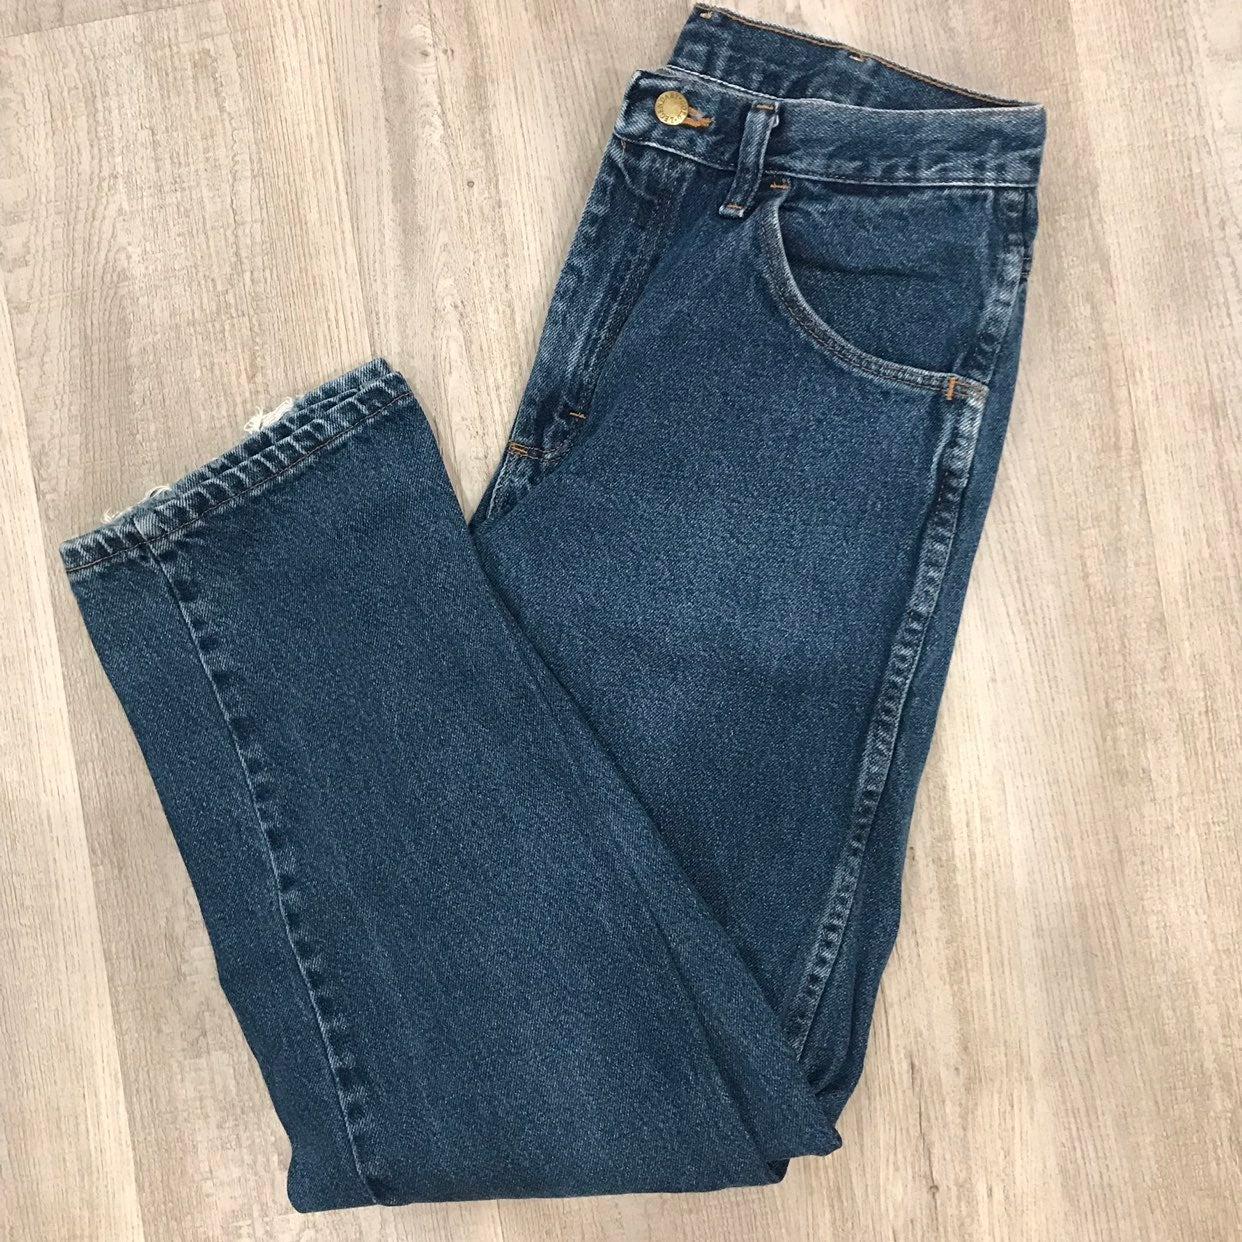 Mens Jeans 31x30